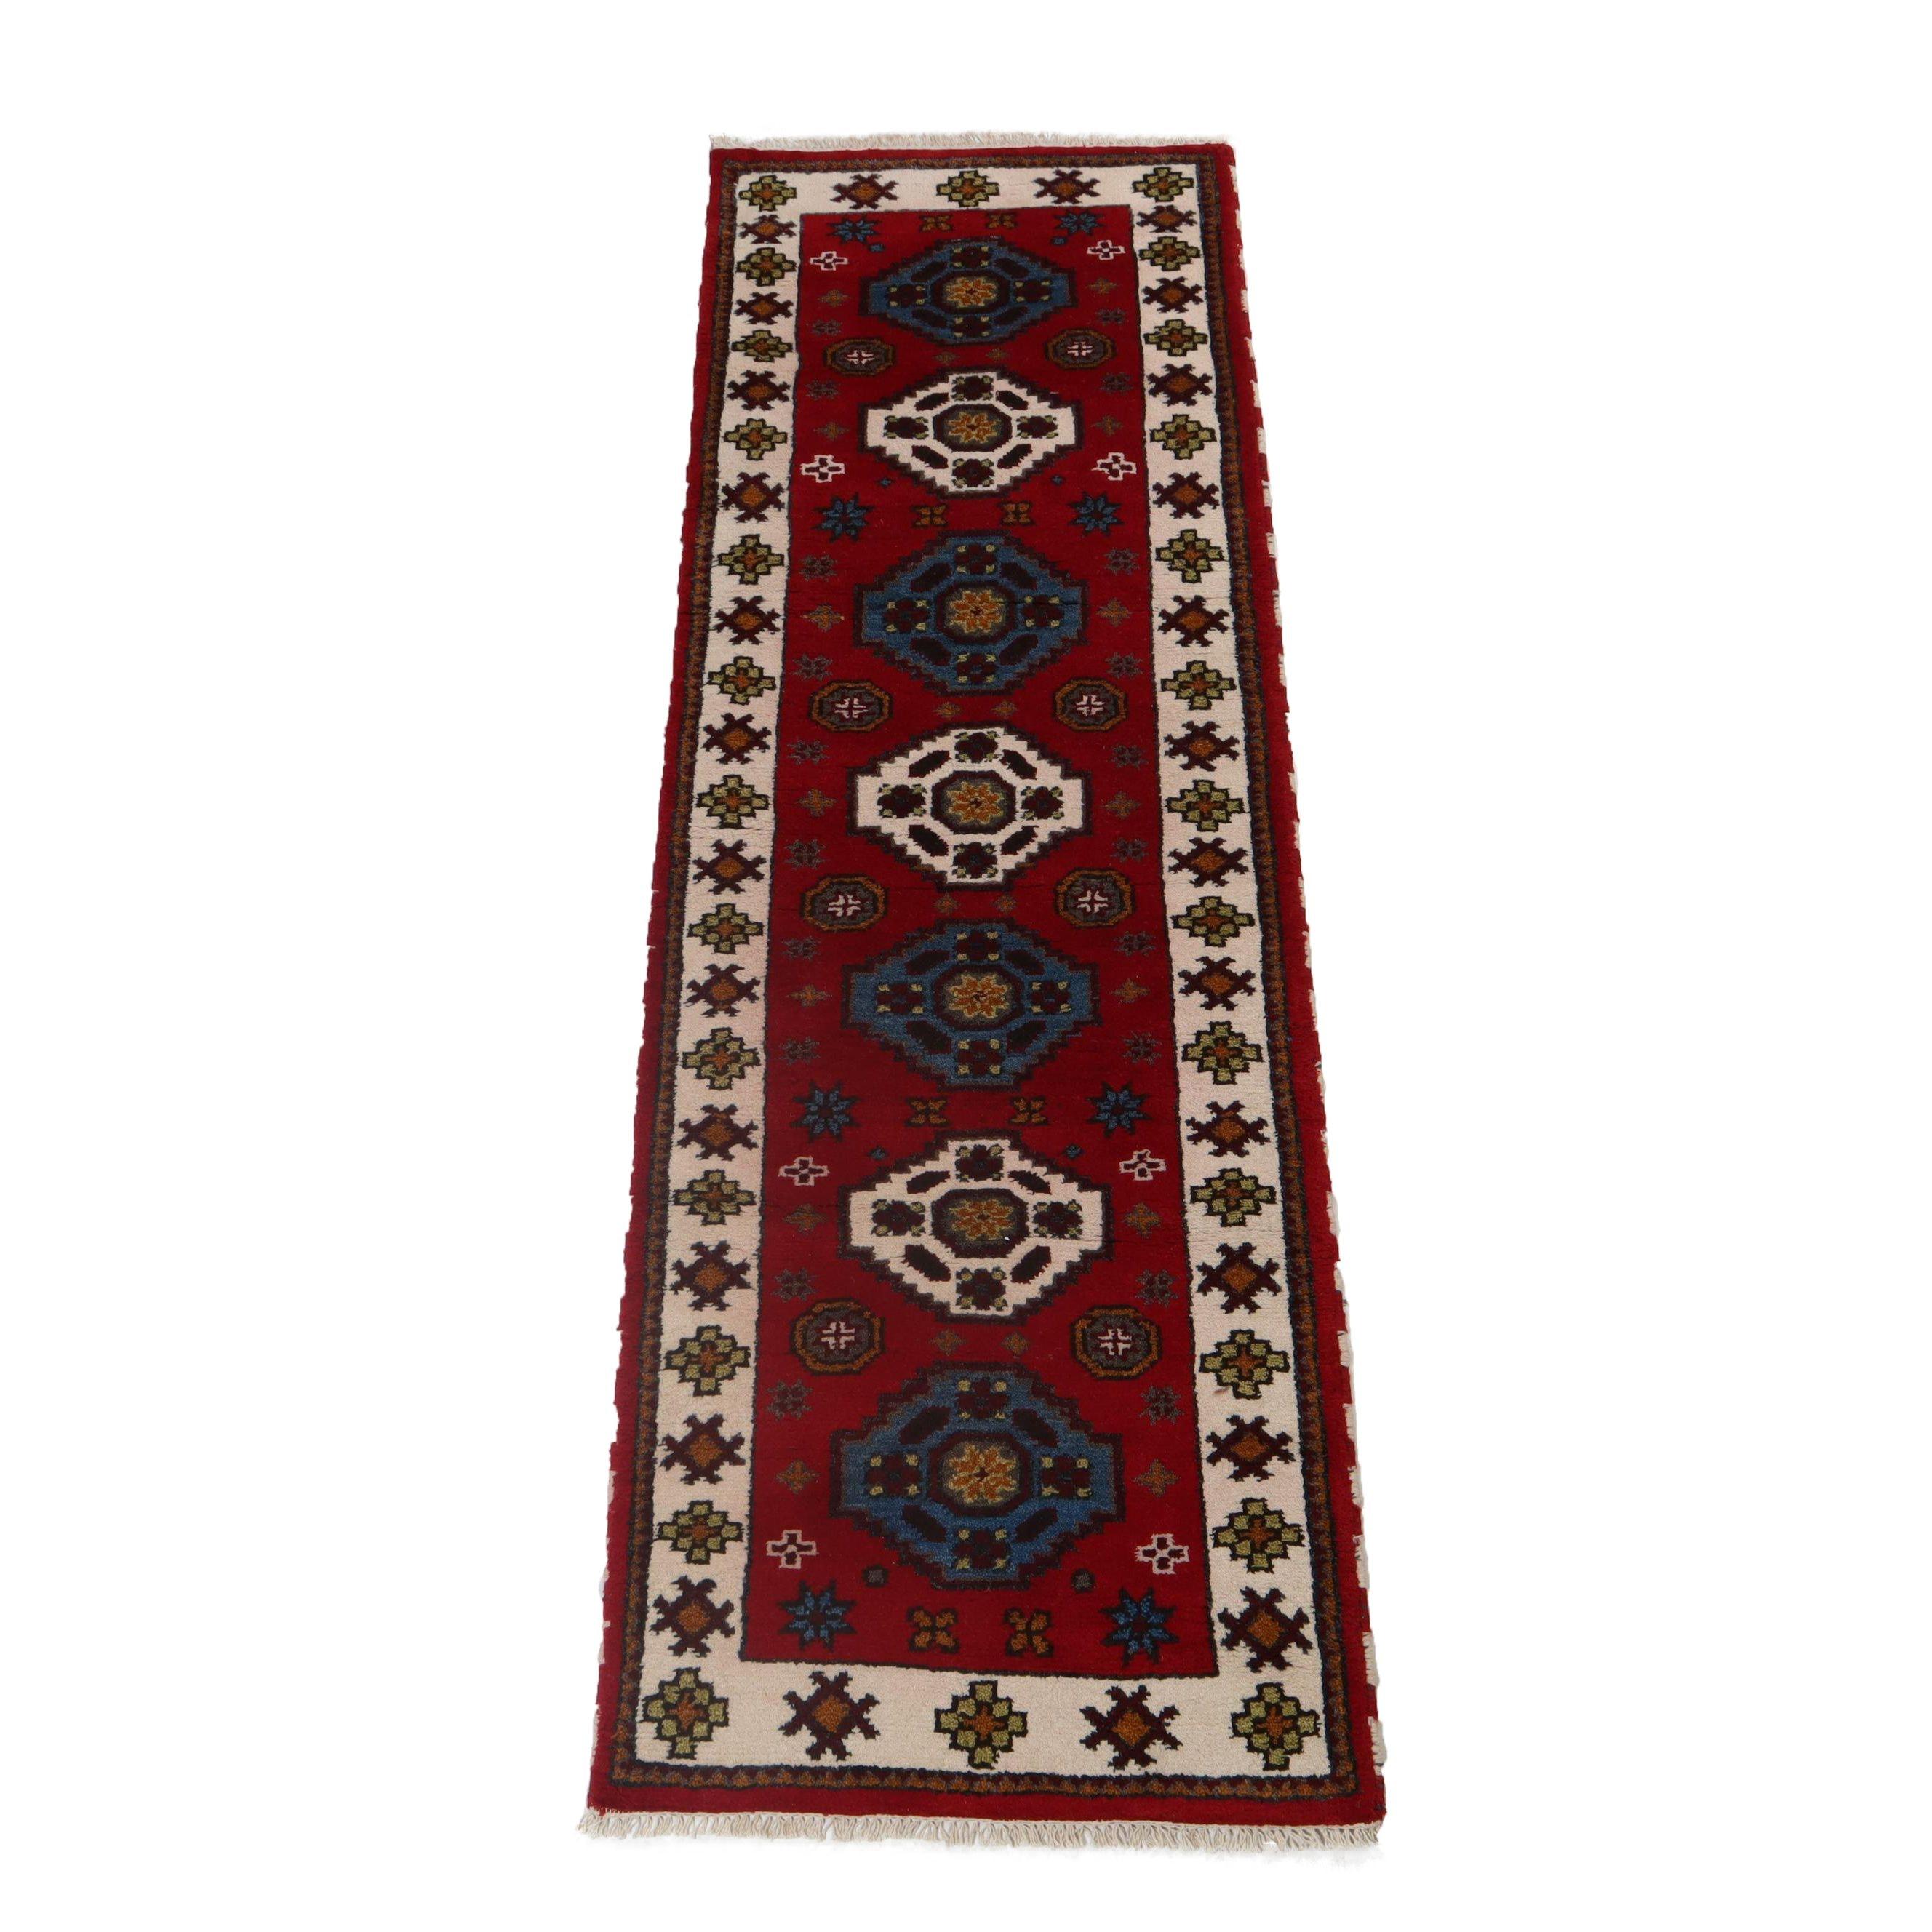 2.8' x 8.5' Hand-Knotted Indo-Caucasian Kazak Wool Carpet Runner